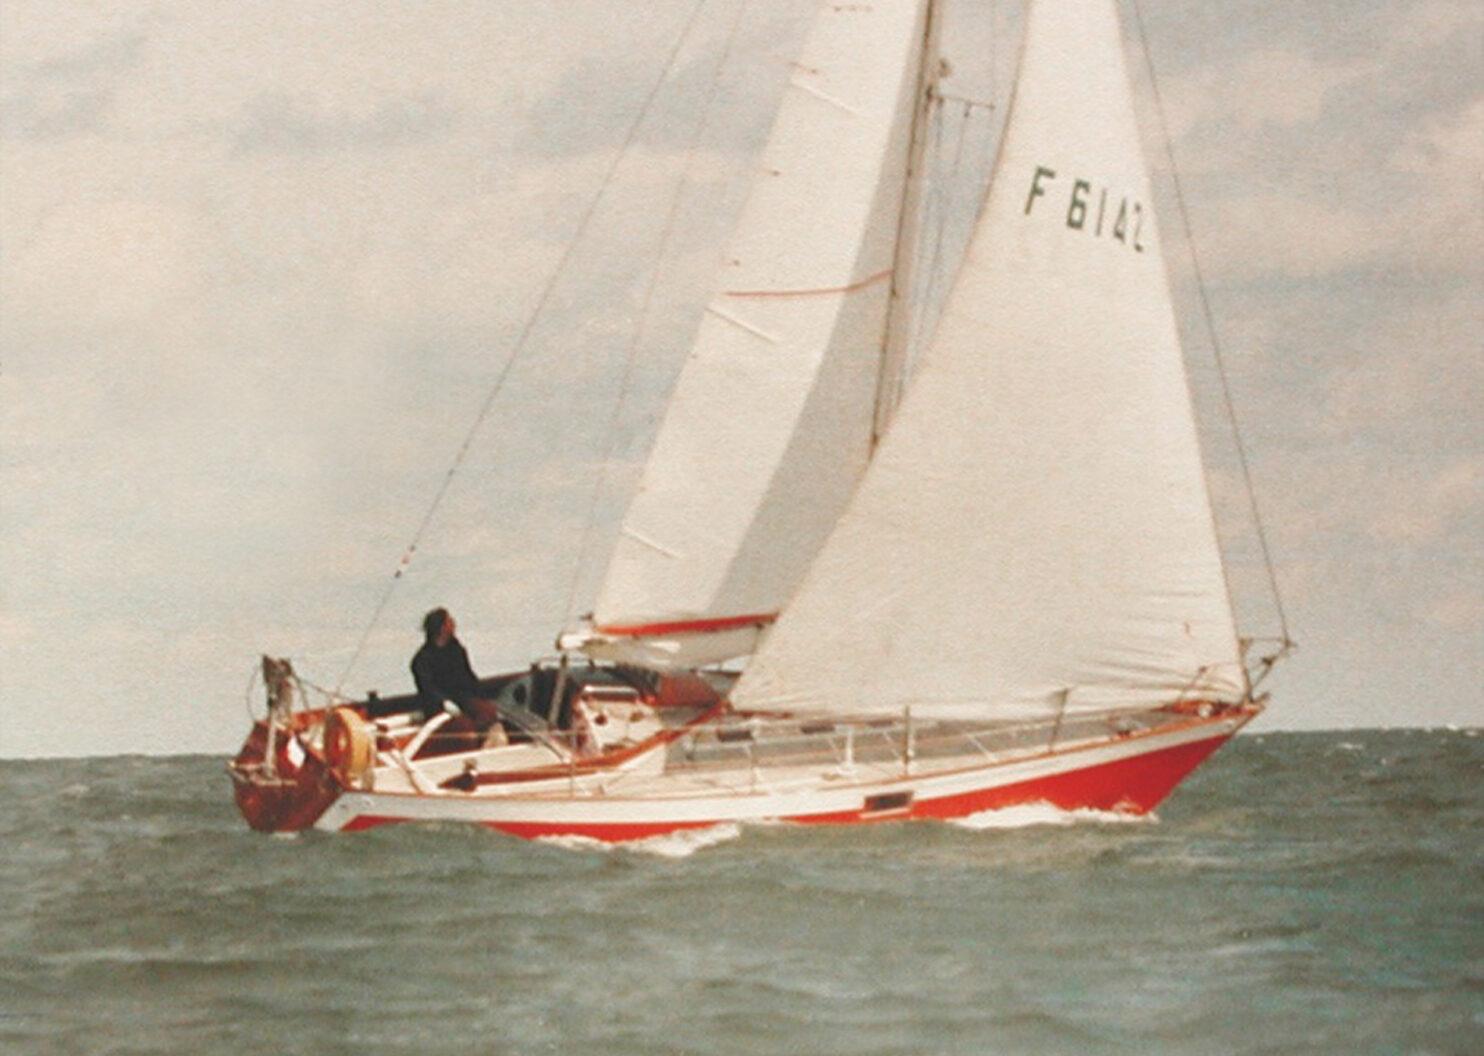 Benoît on his boat, Kilaourou, 1989.